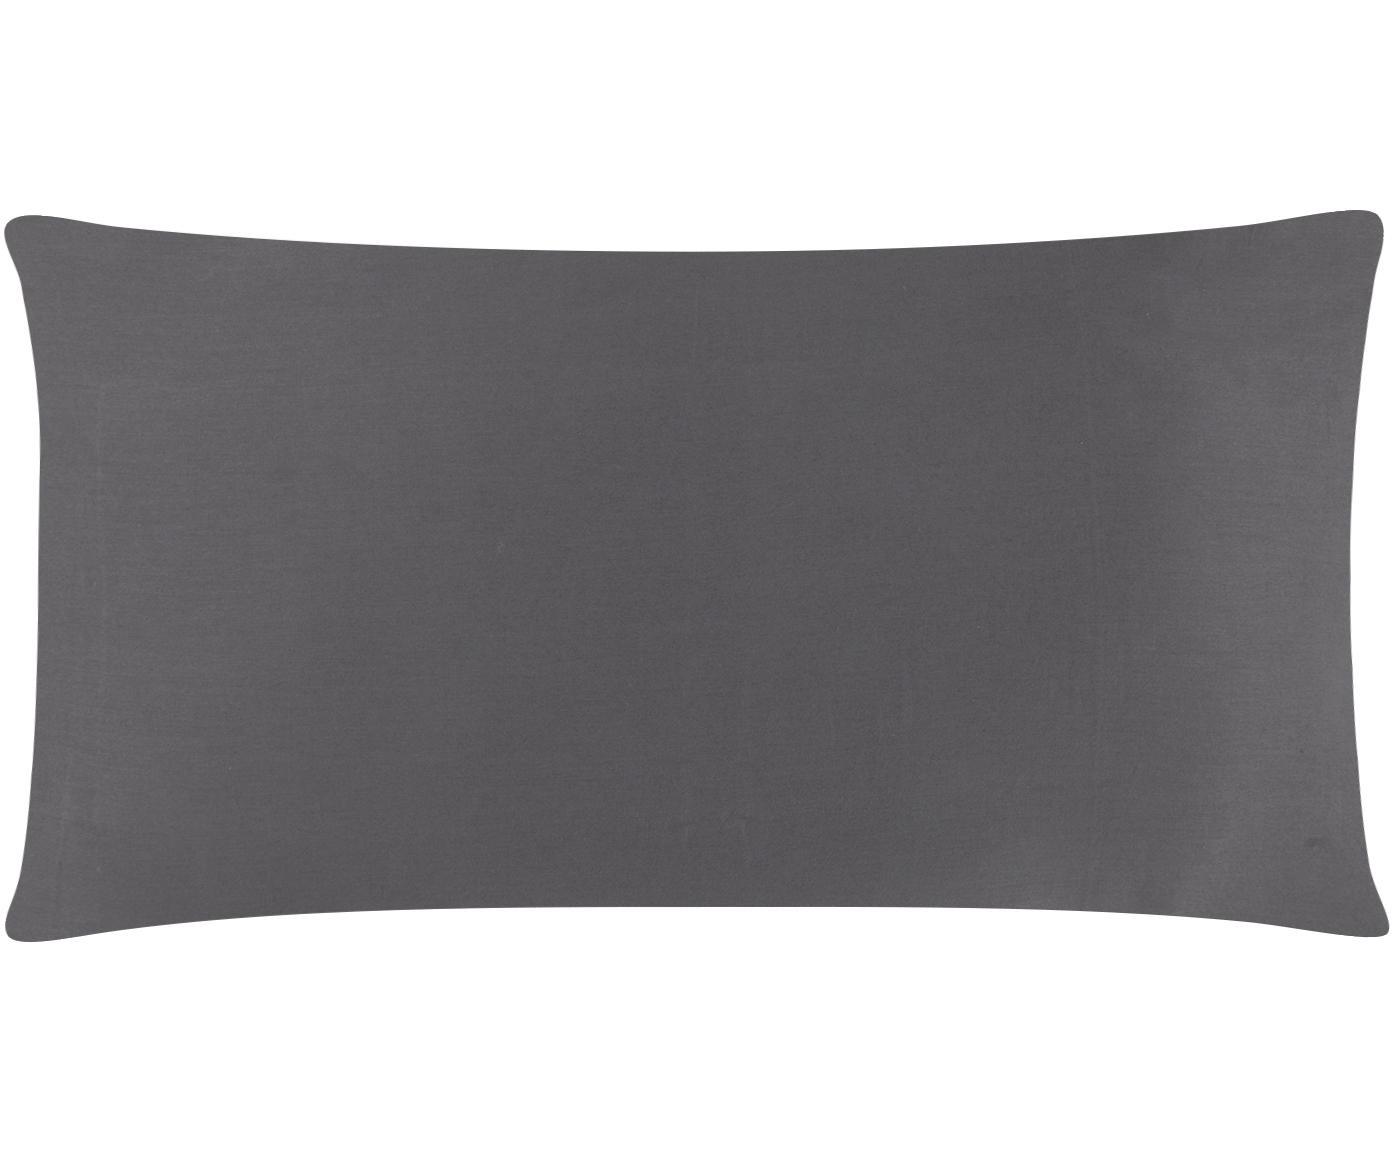 Funda de almohada de satén Comfort, Gris oscuro, An 45 x L 85 cm